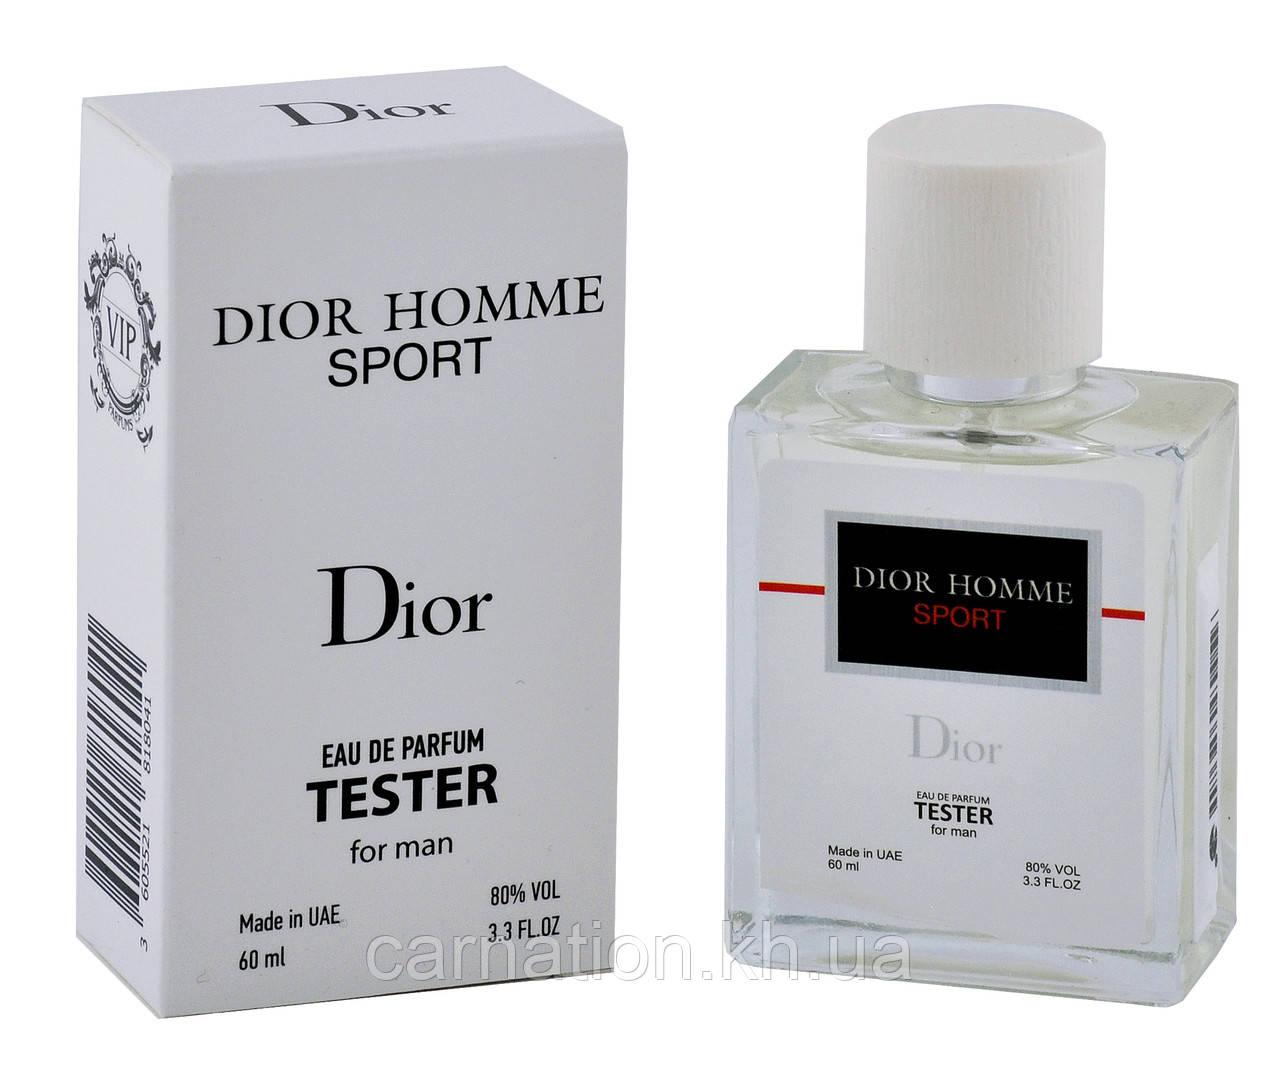 Мужской тестер Dior Homme Sport Duty Free Vip (Диор Хом Спорт)  60 мл